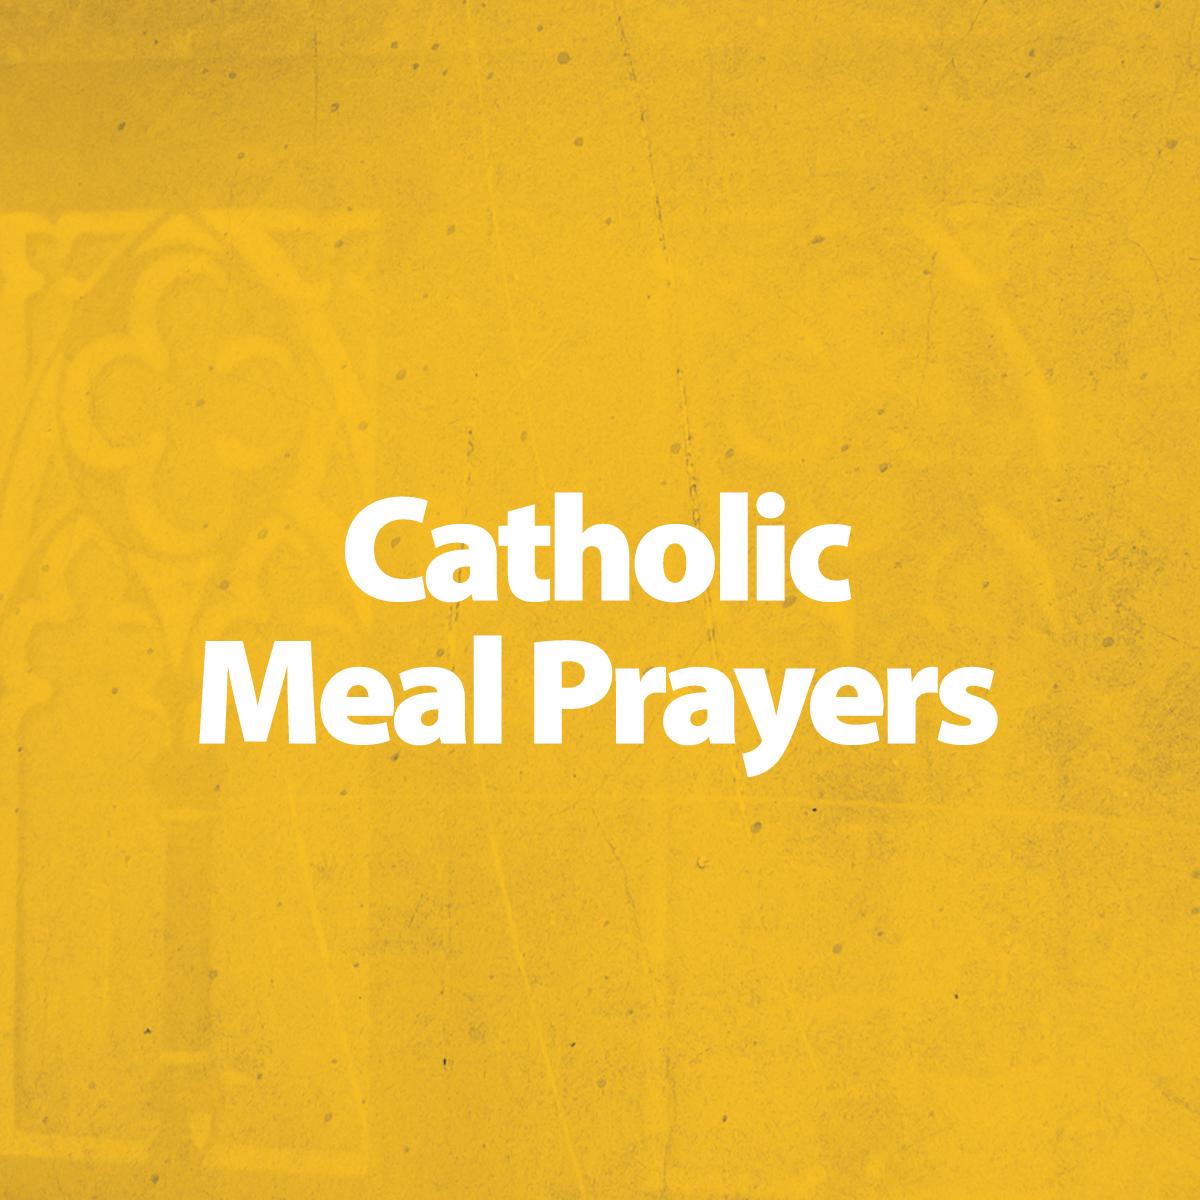 catholic meal prayers